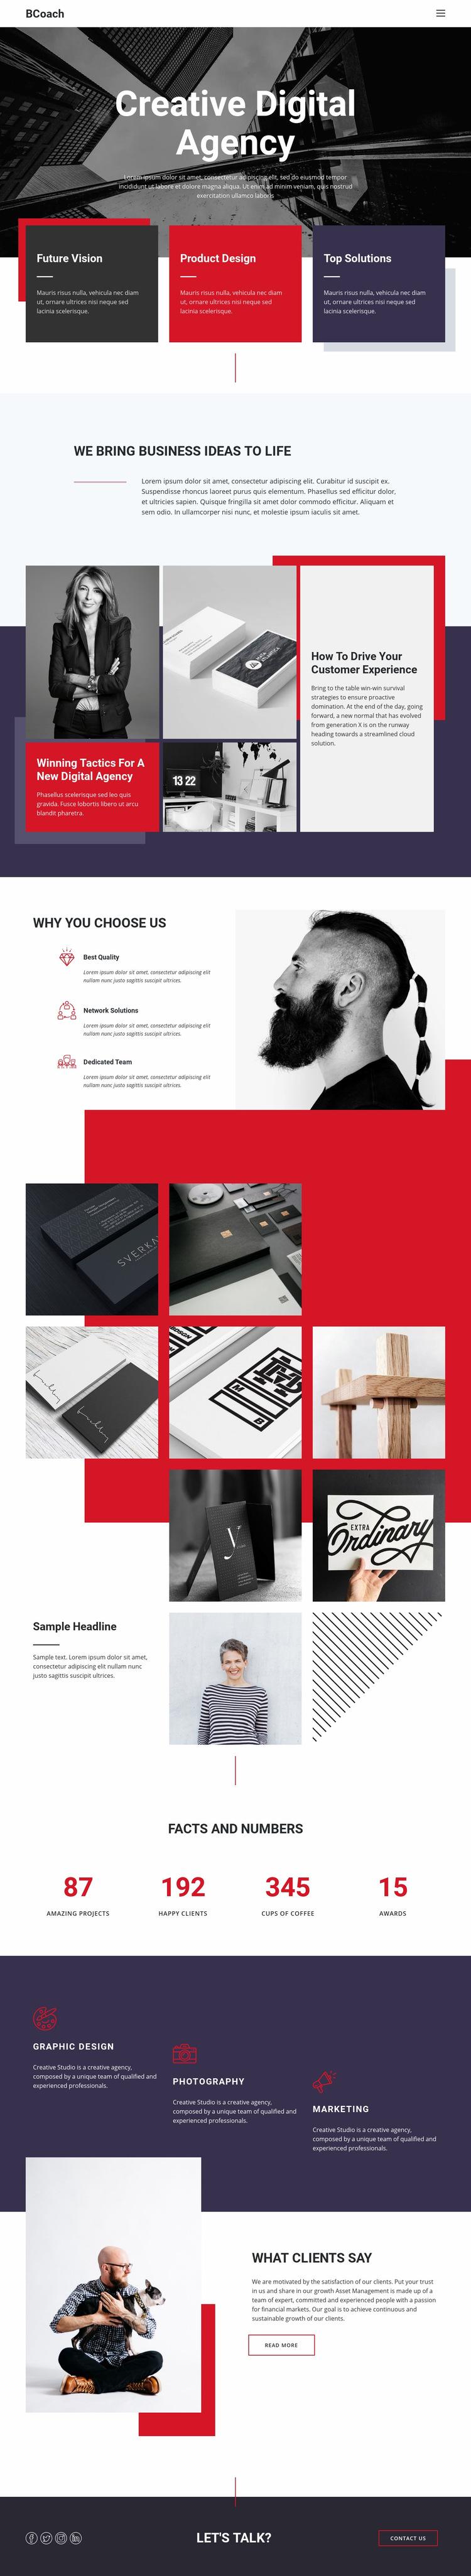 Digital business agency Web Page Design